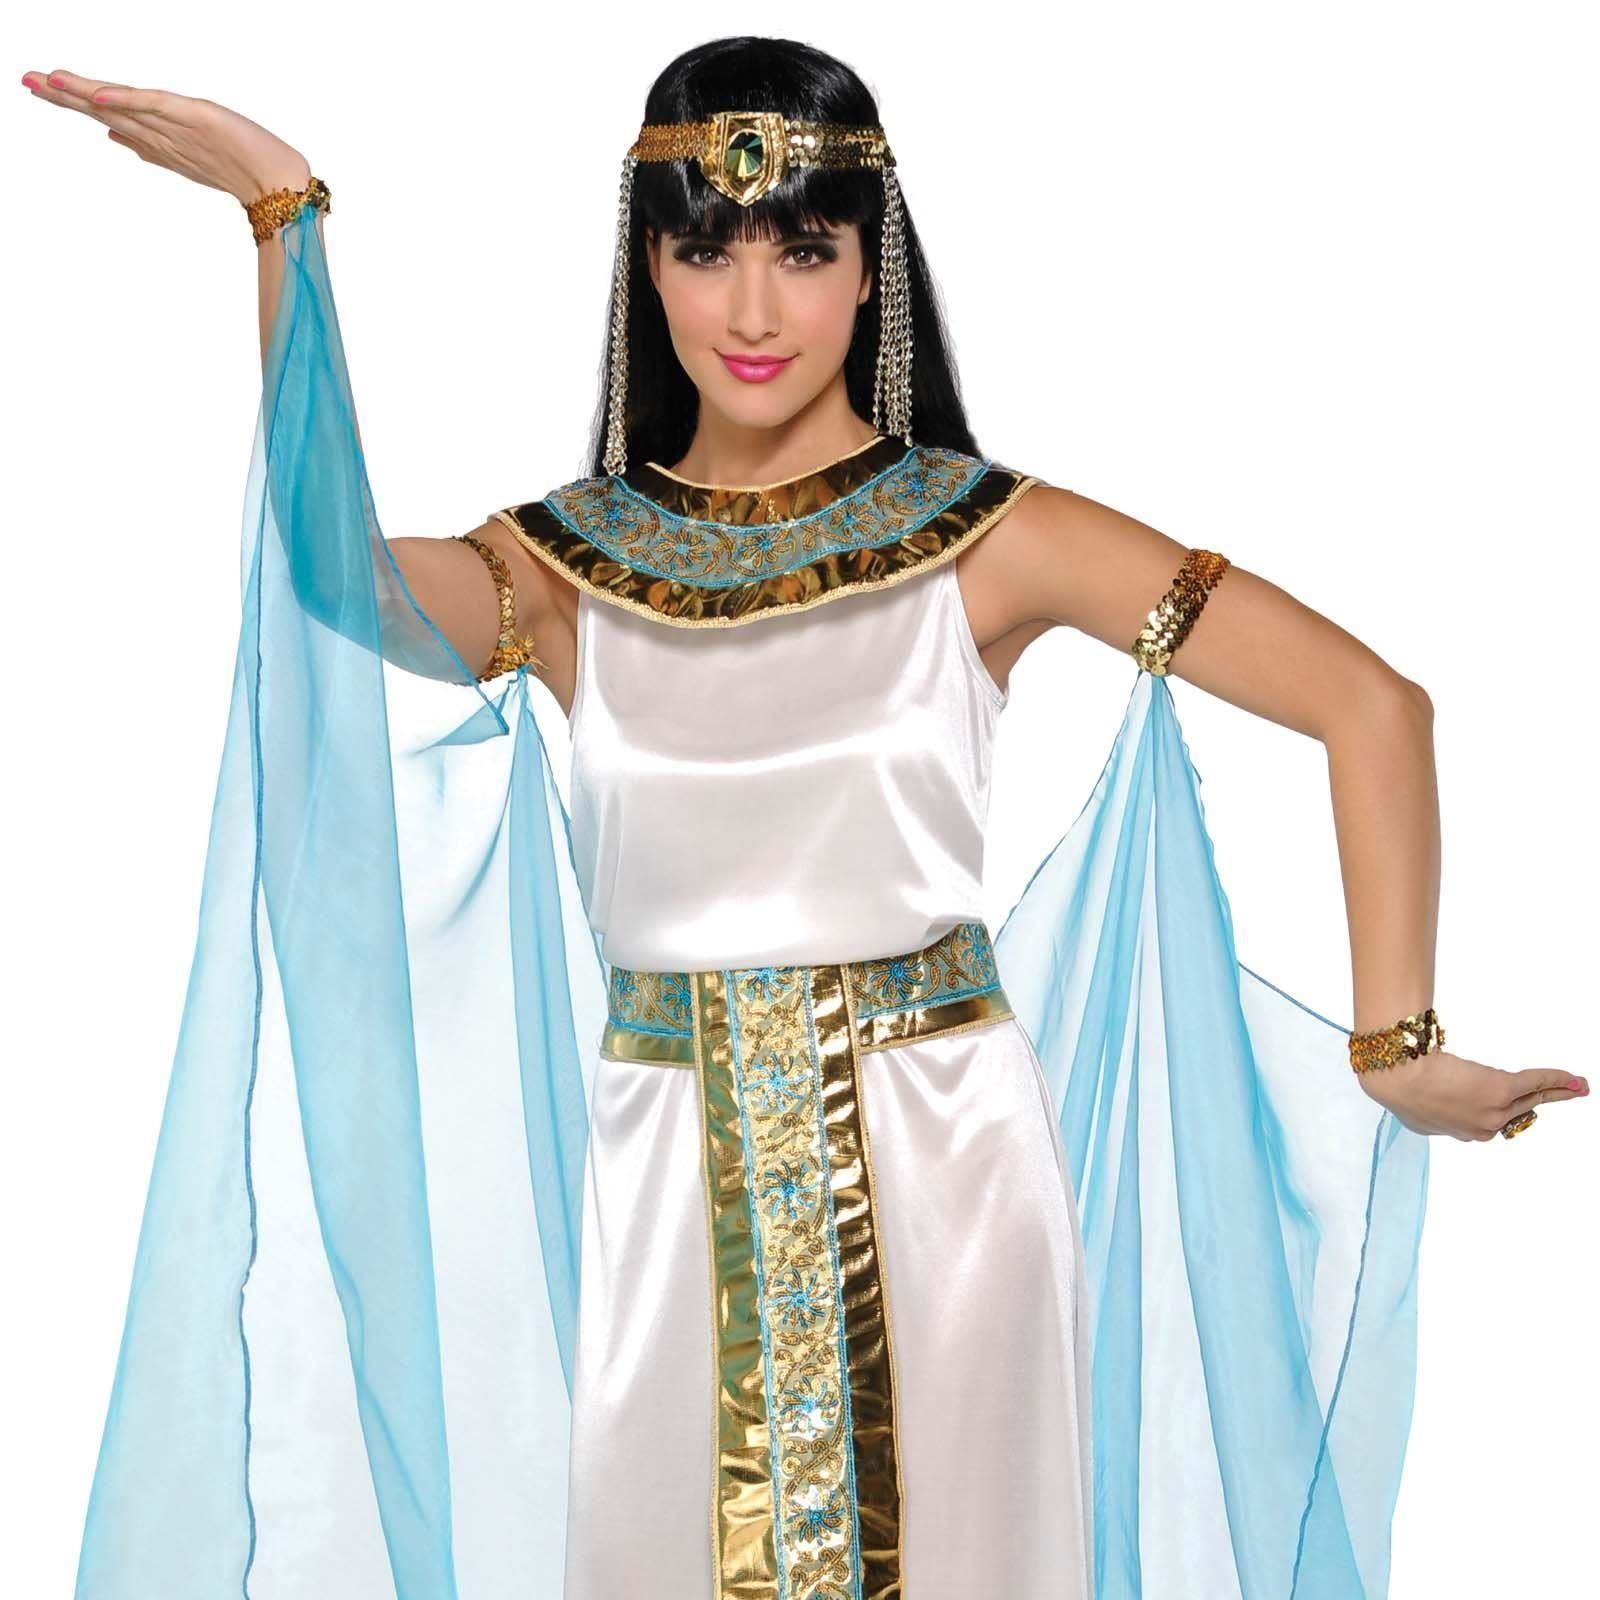 Relativ Deguisement Cleopatre Fait Maison #15: Femmes-Reine-Egyptienne  BV41